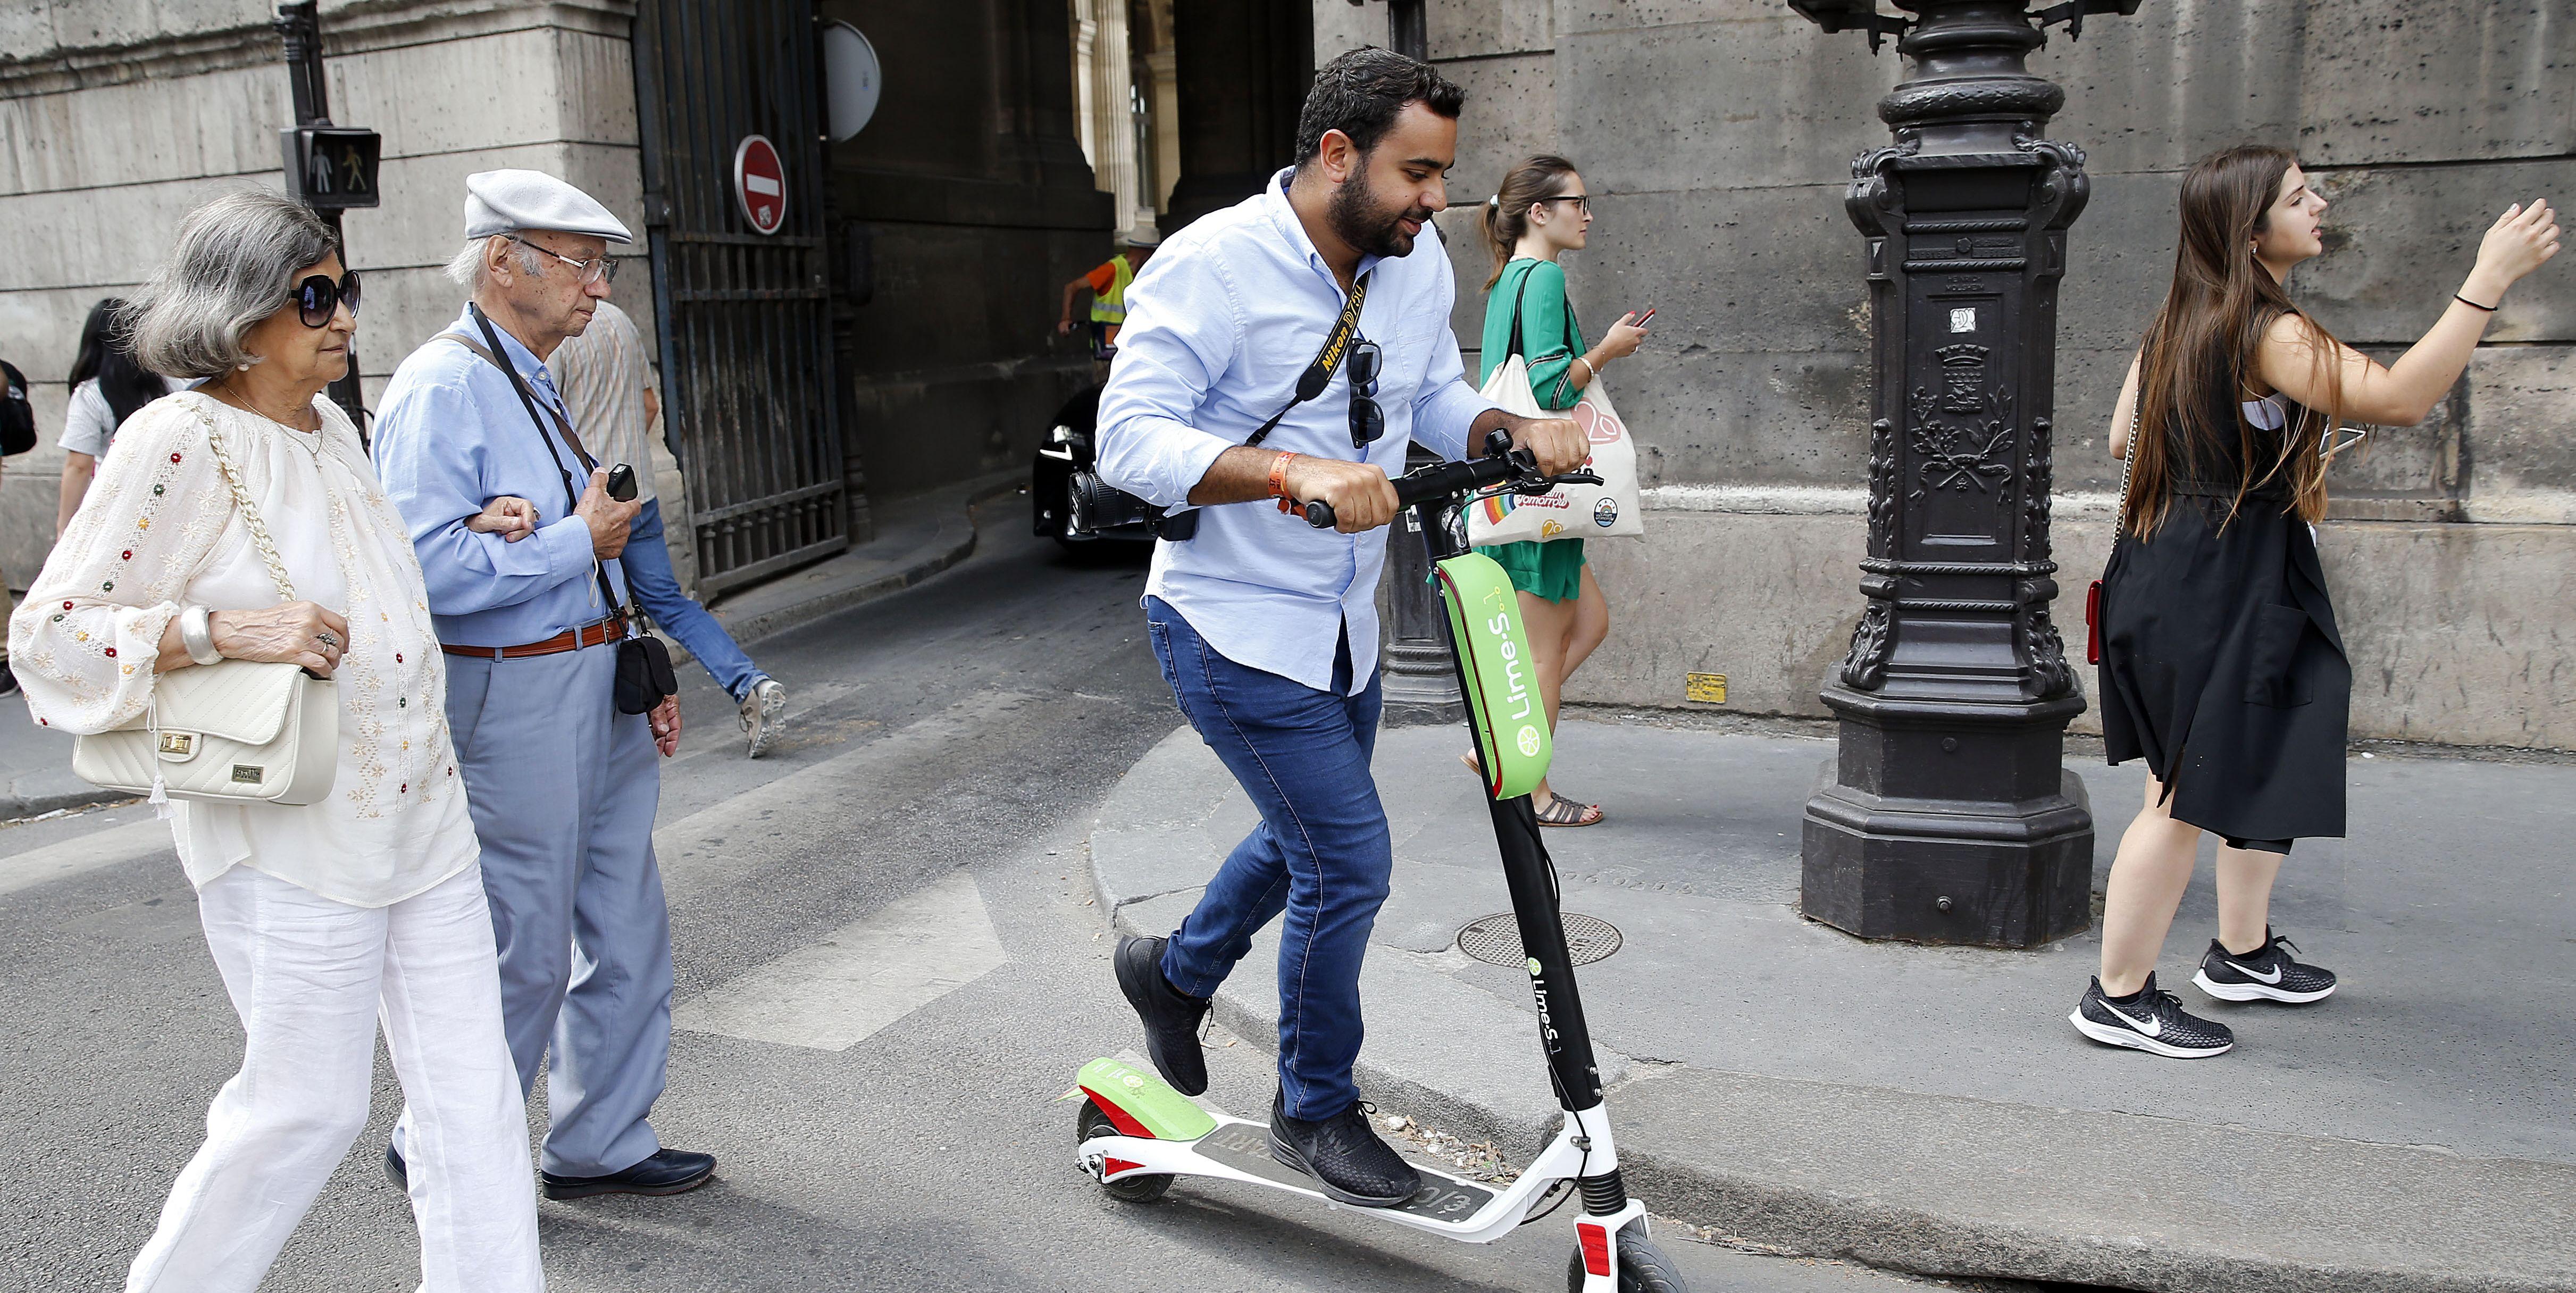 patinetes eléctricos peligrosos